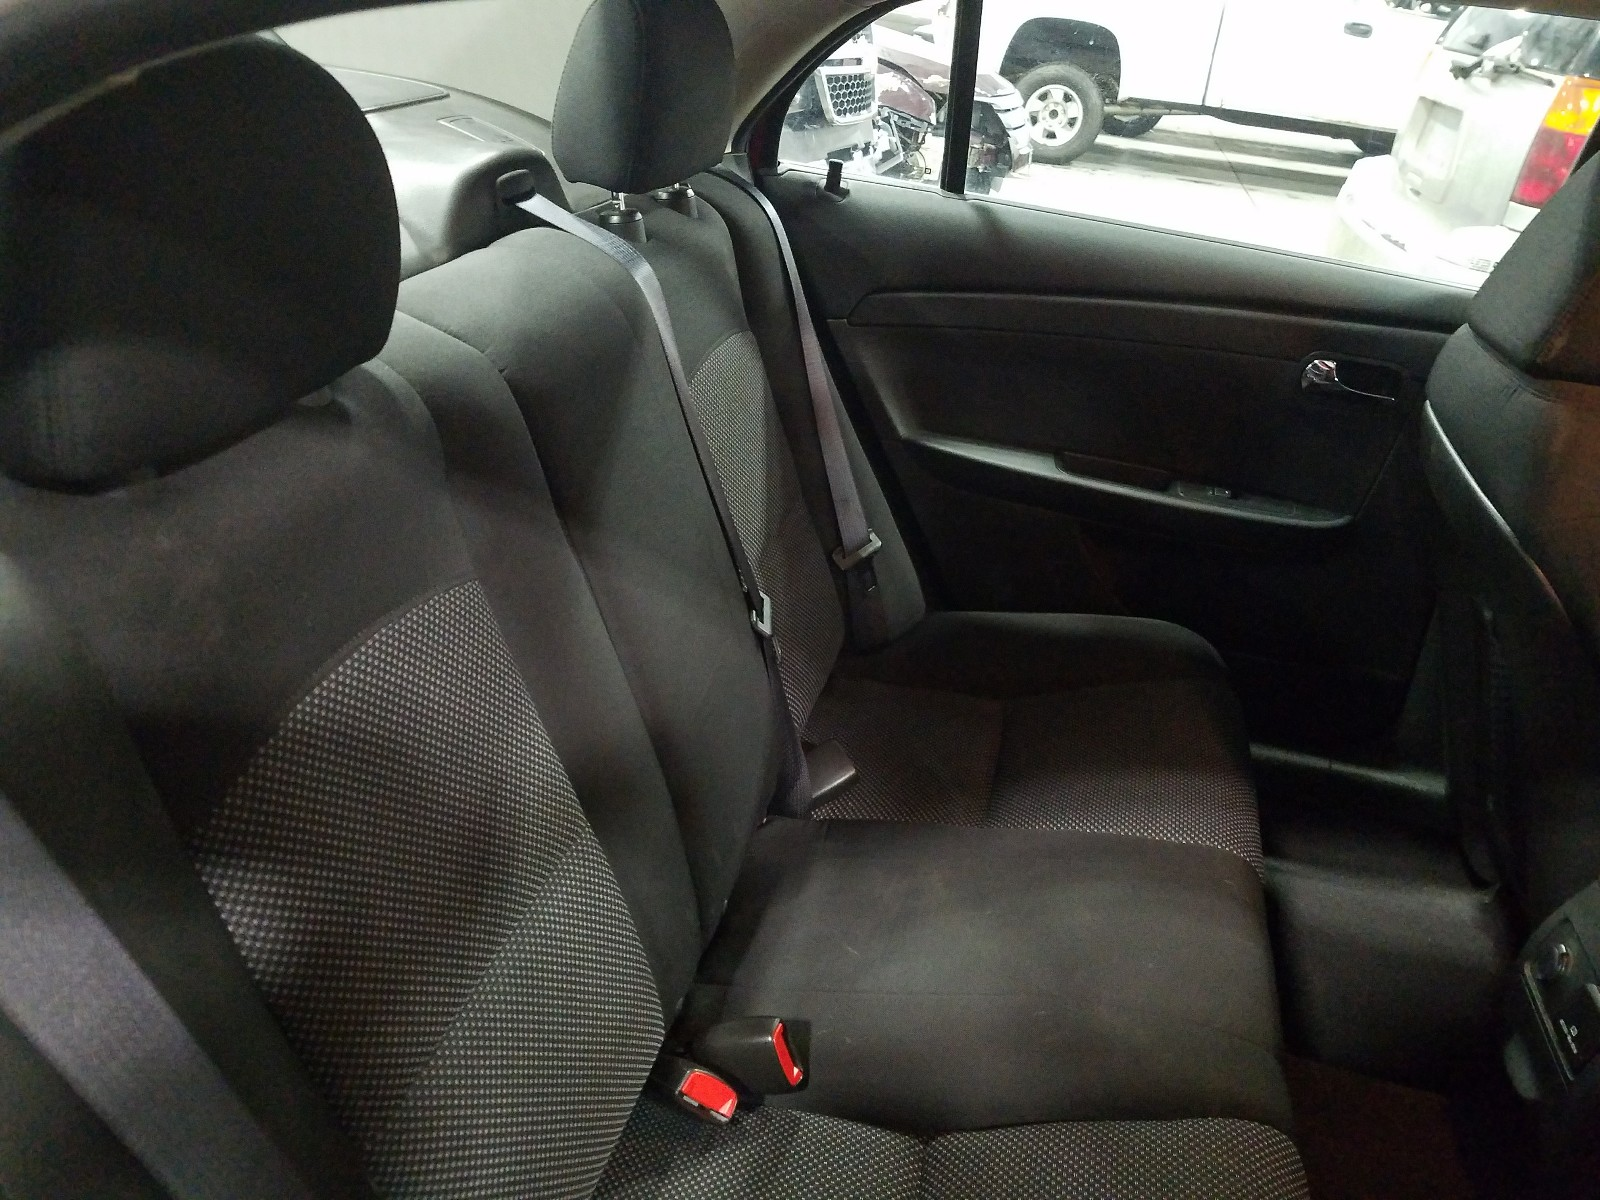 1G1ZC5E08CF261214 - 2012 Chevrolet Malibu 1Lt 2.4L detail view